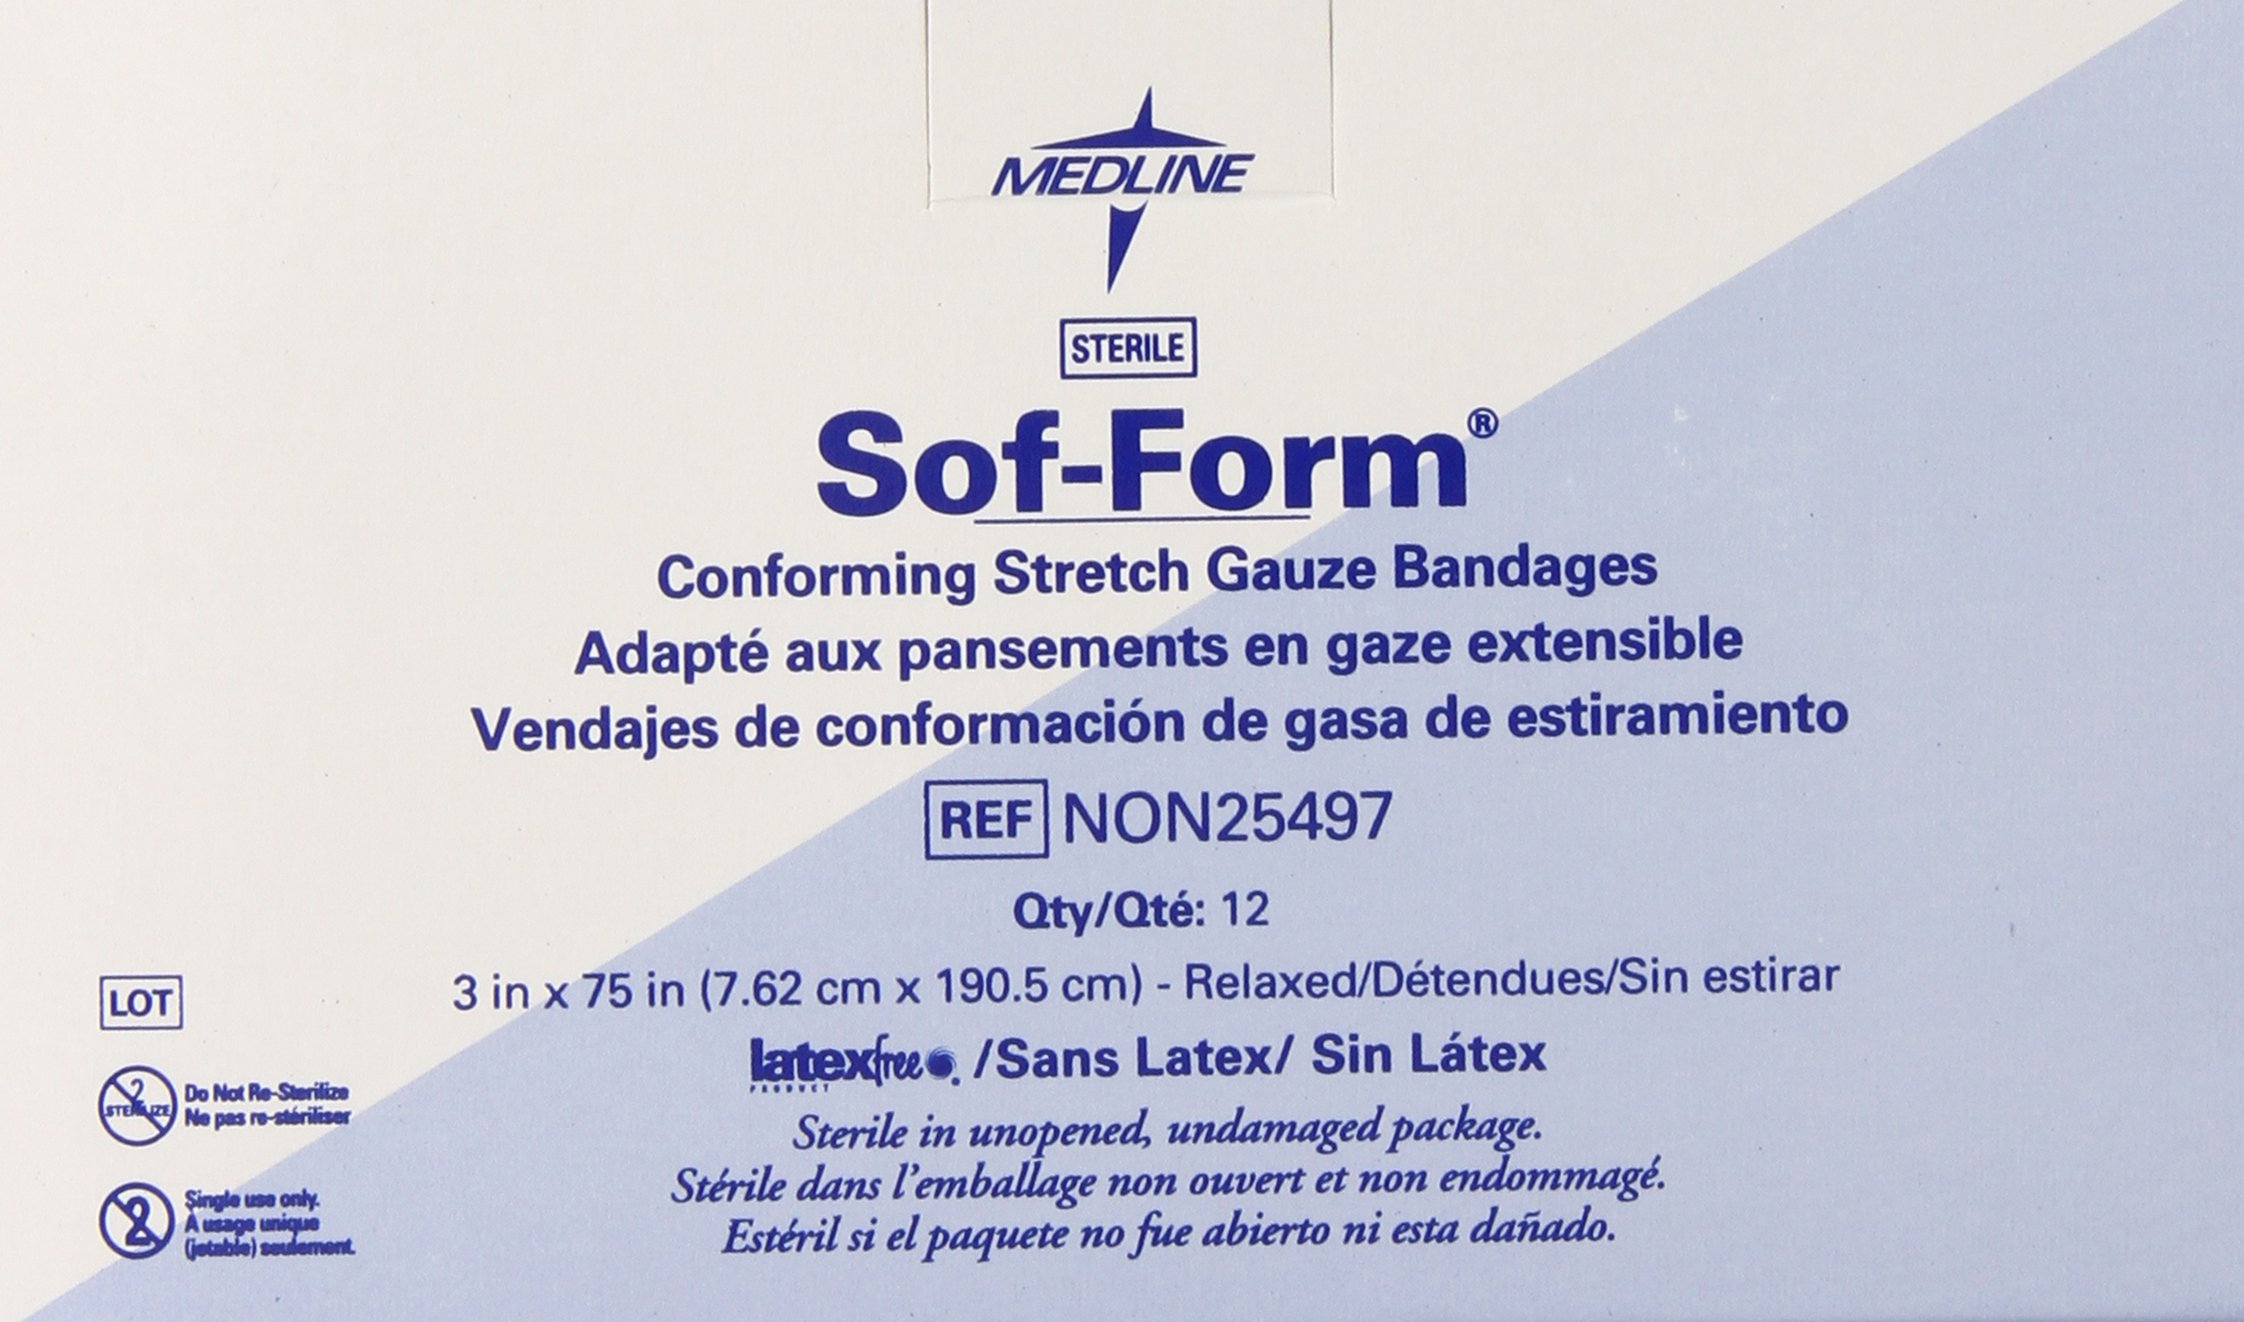 Medline Bandage Gauze Sof-form 3 Inch x 75 Inch, 96 Count by Medline